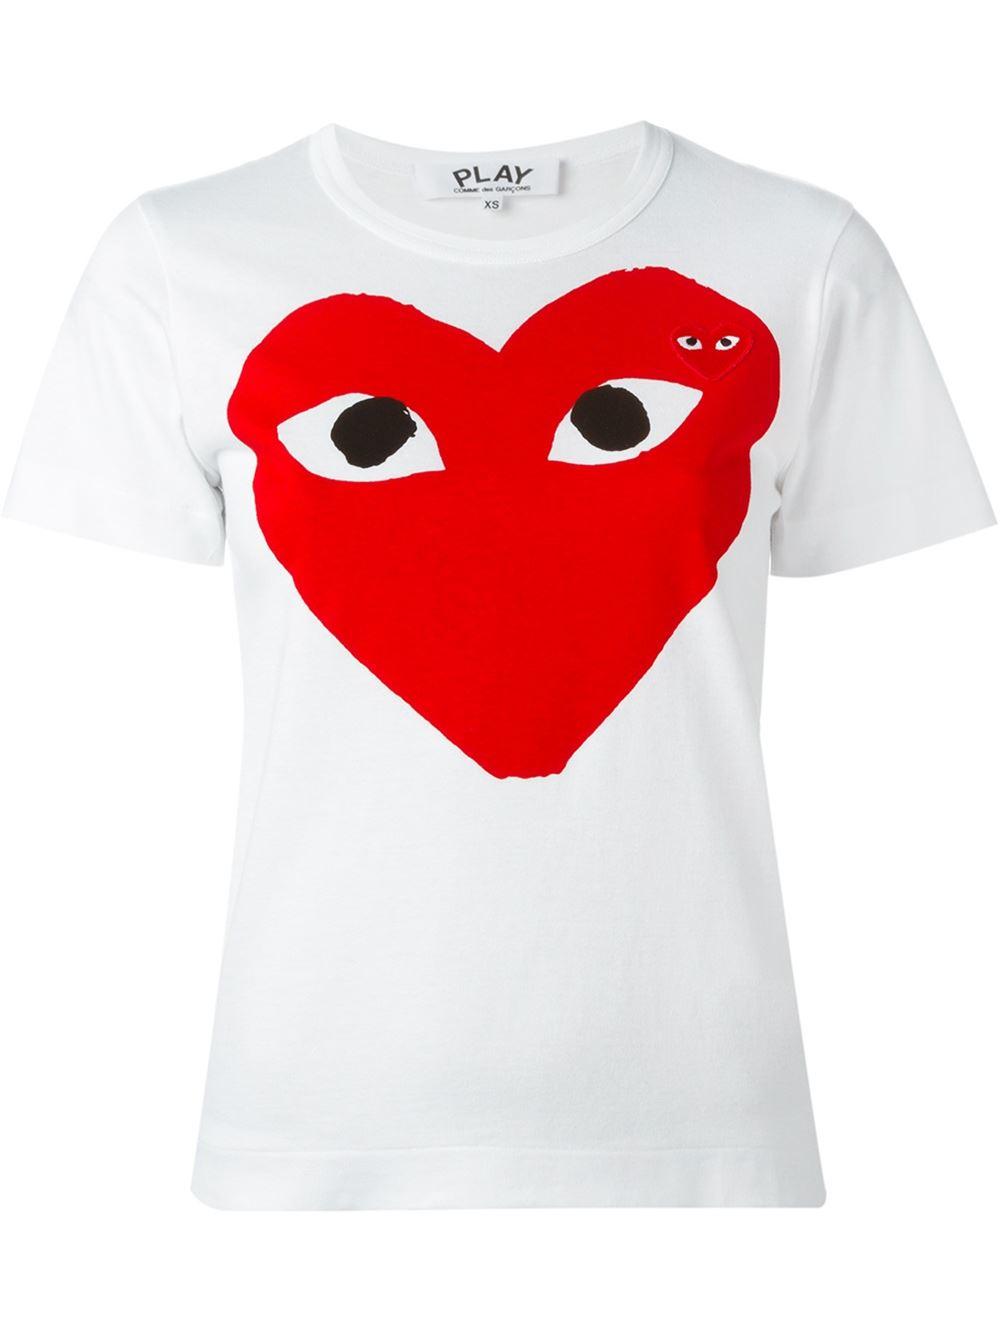 Play comme des garçons Heart Print T-shirt in Red | Lyst